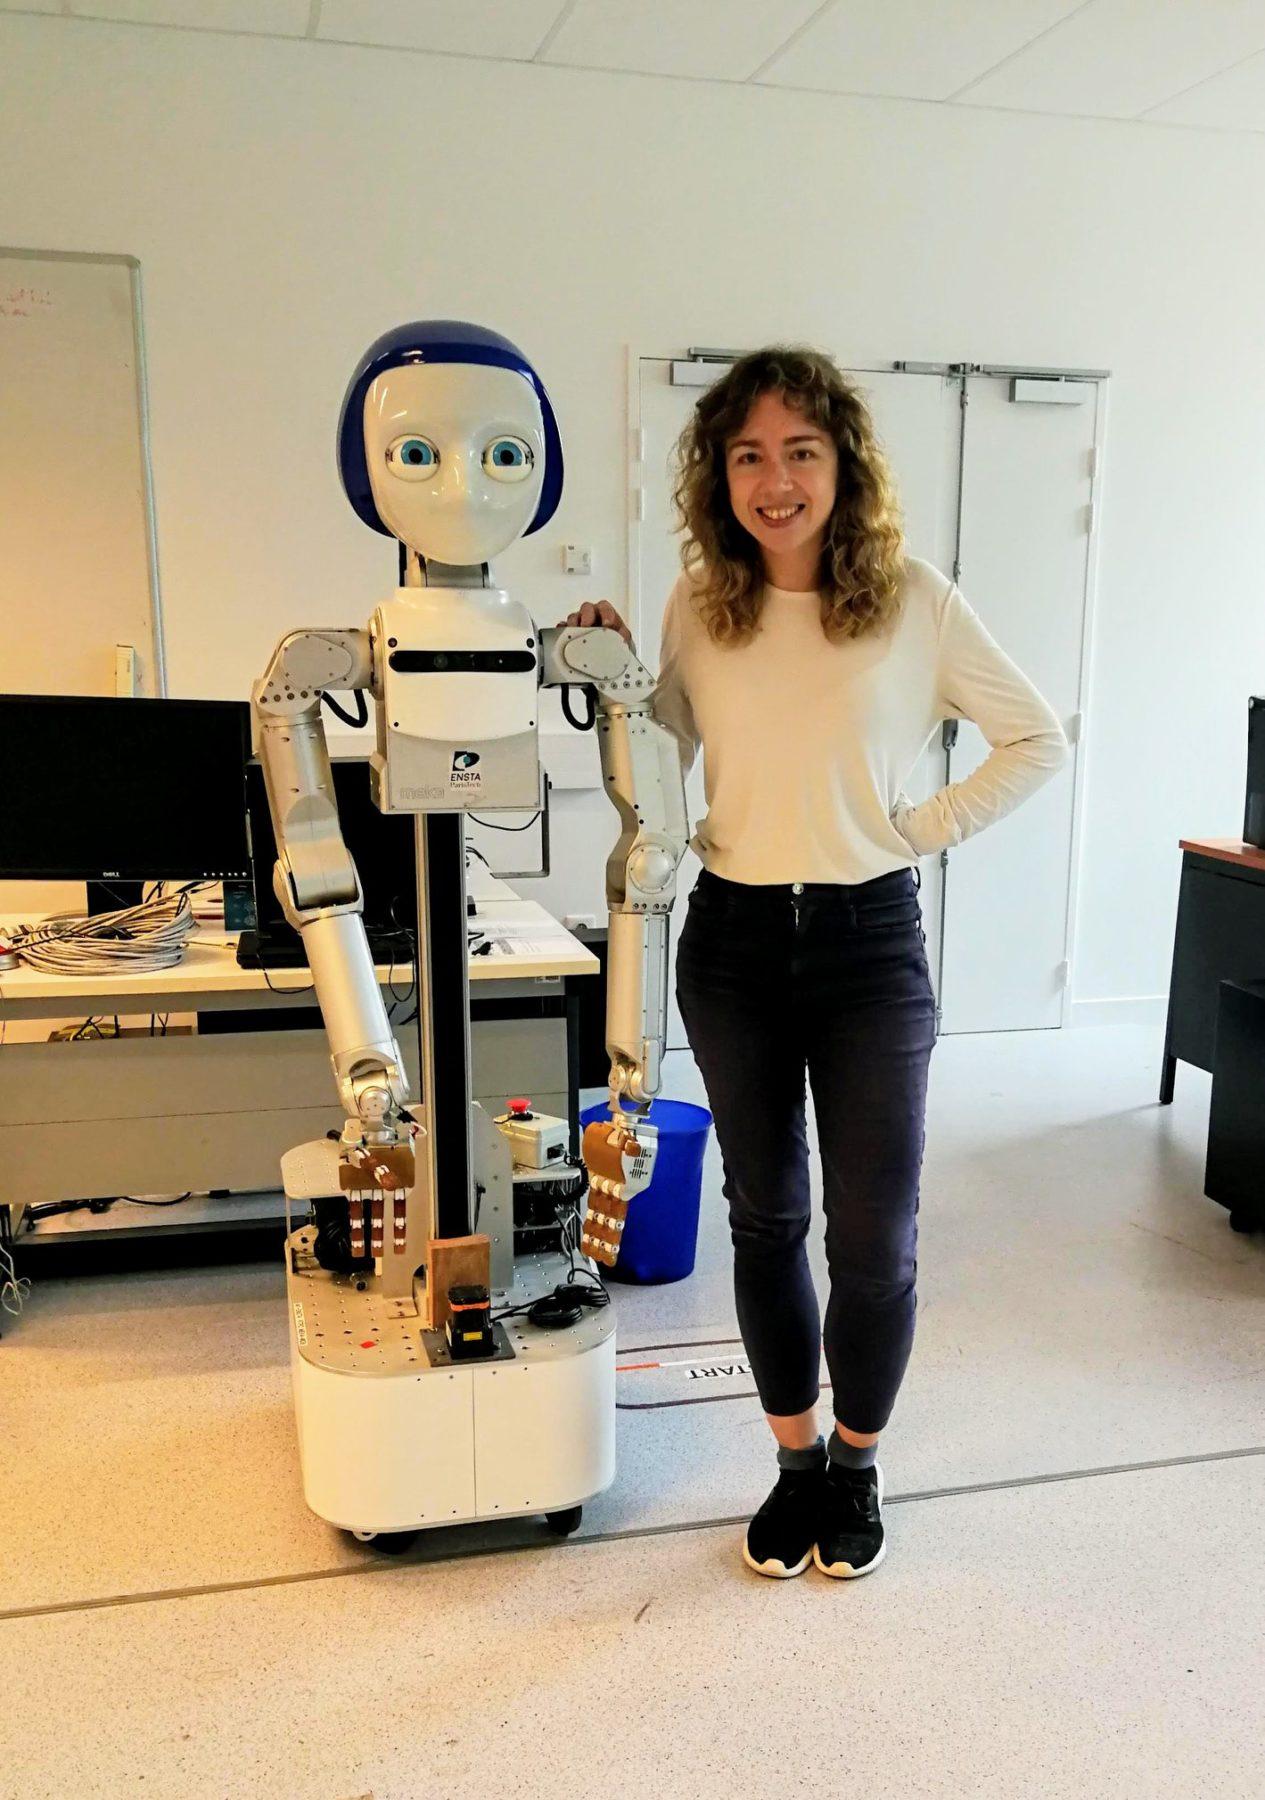 Women in robotics on International Women's Day 2019